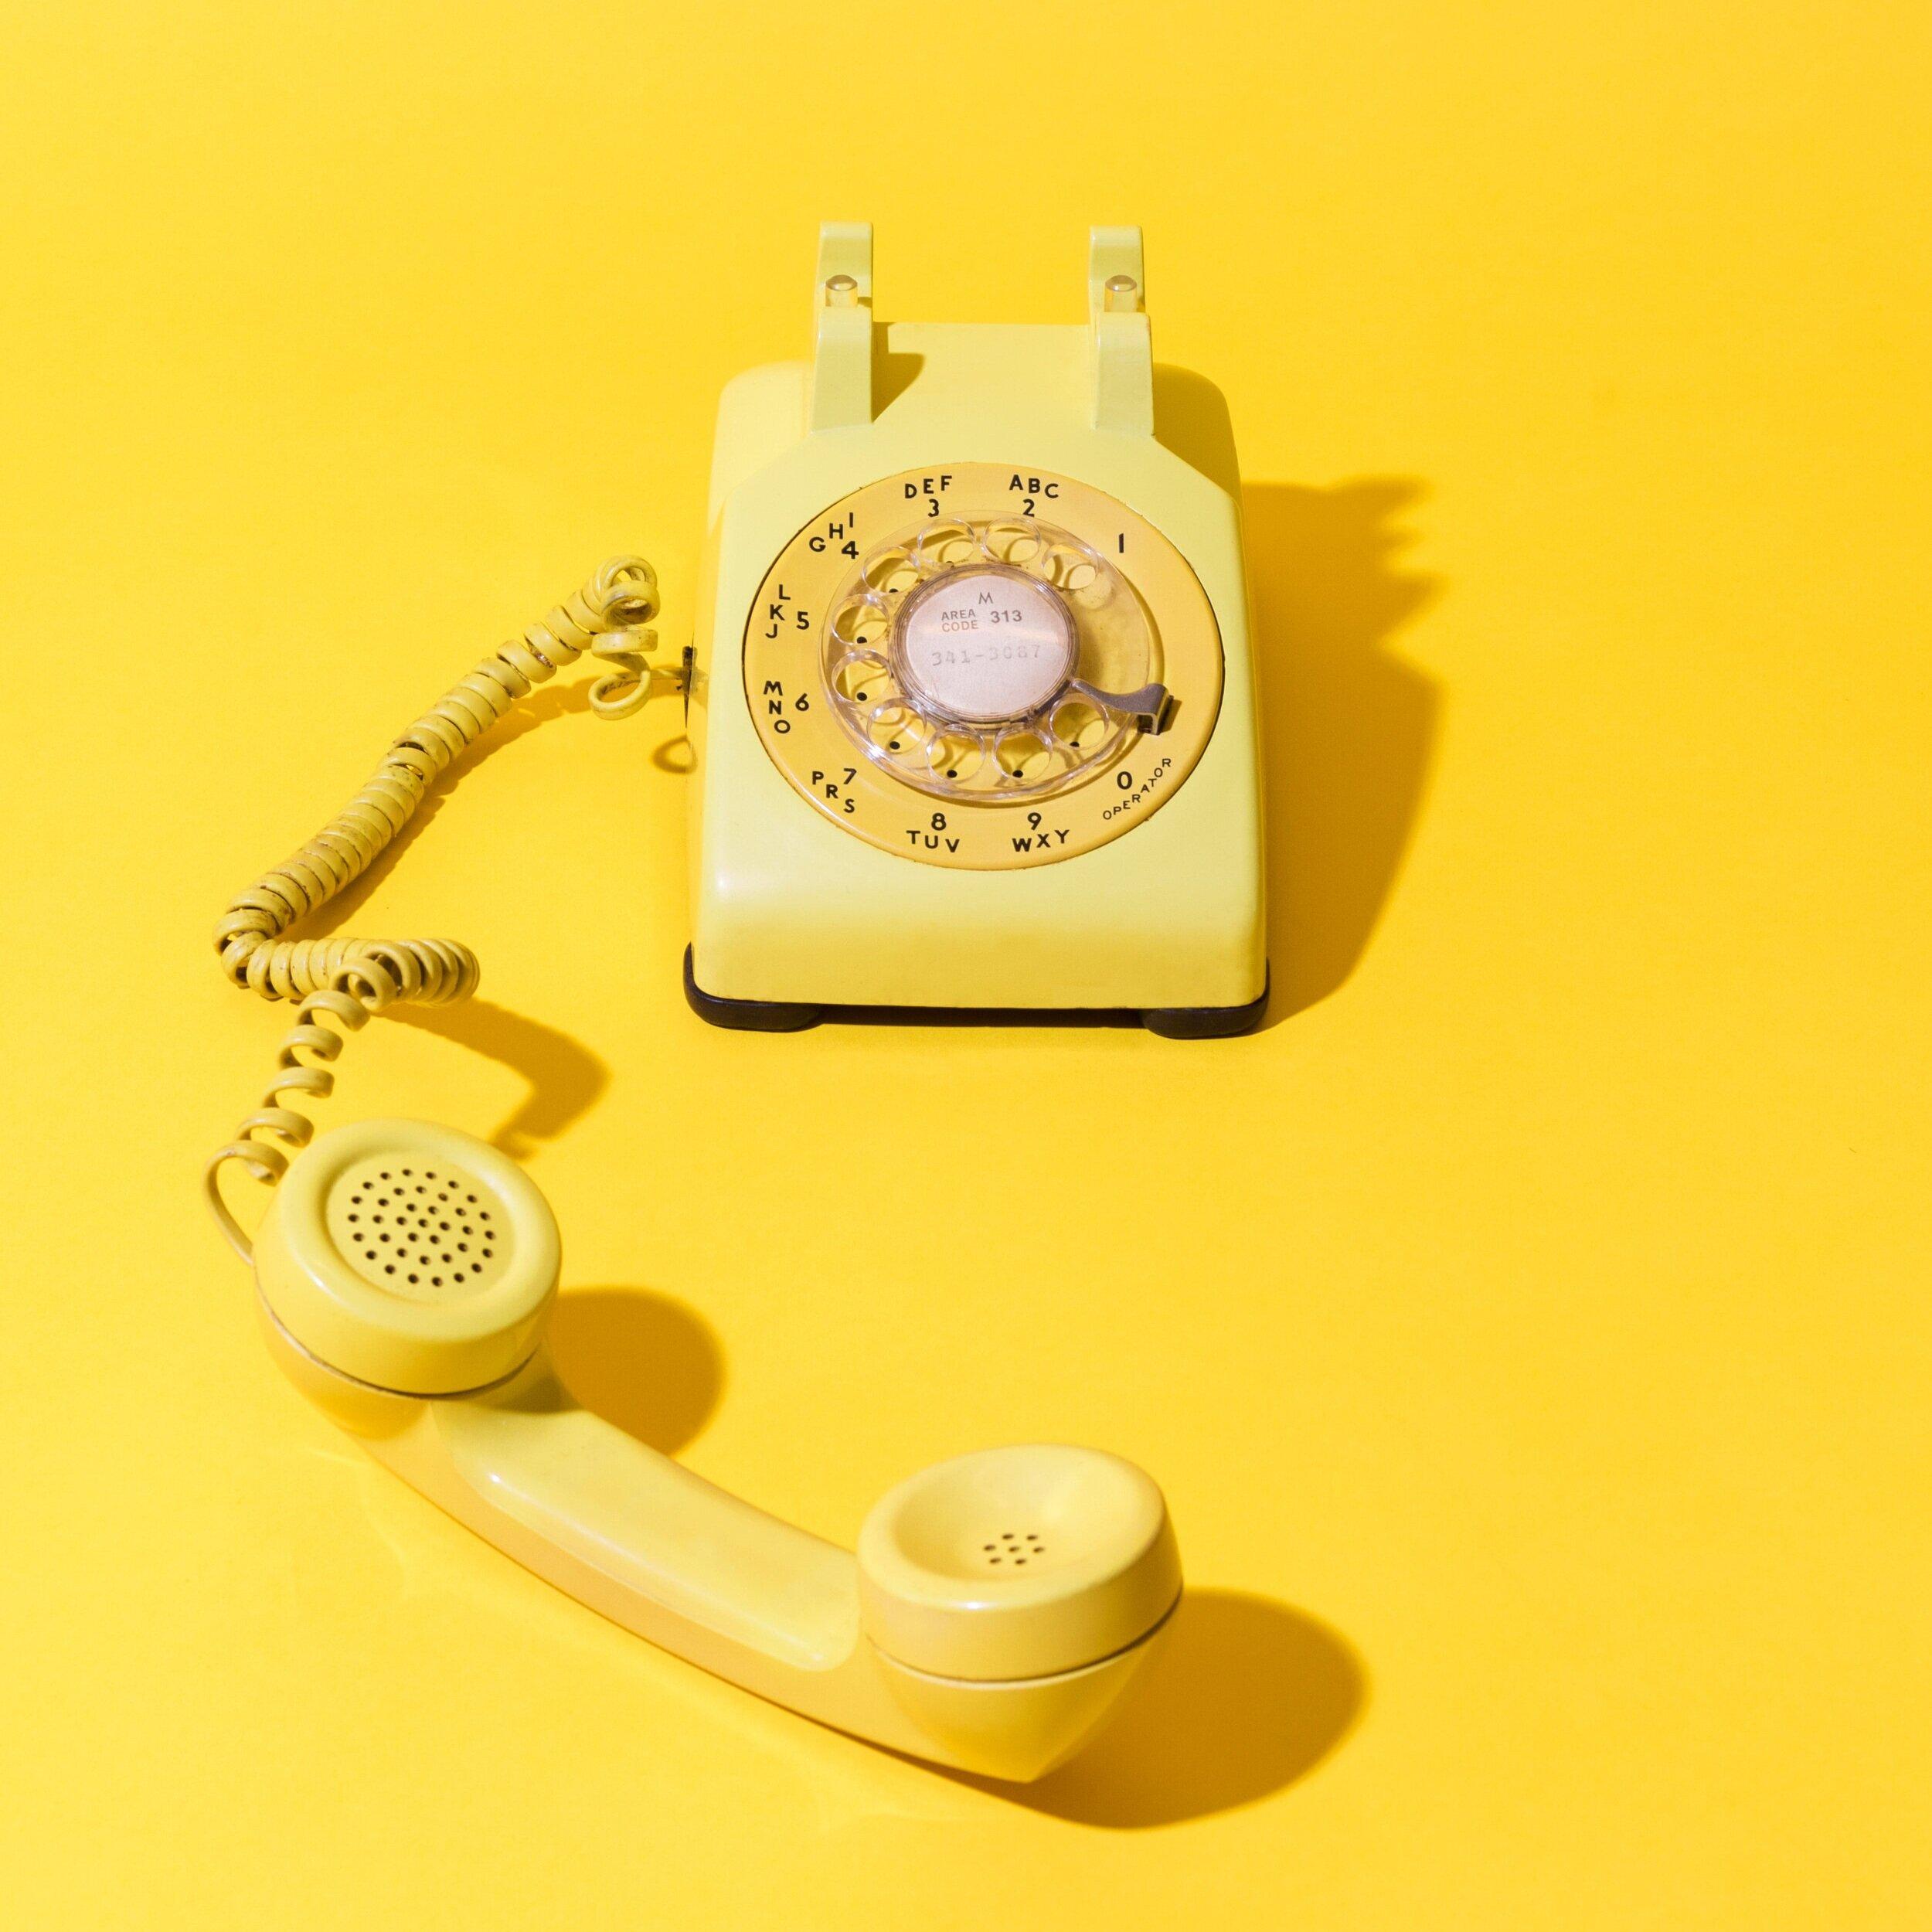 soona yellow phone-0053 (2).jpg